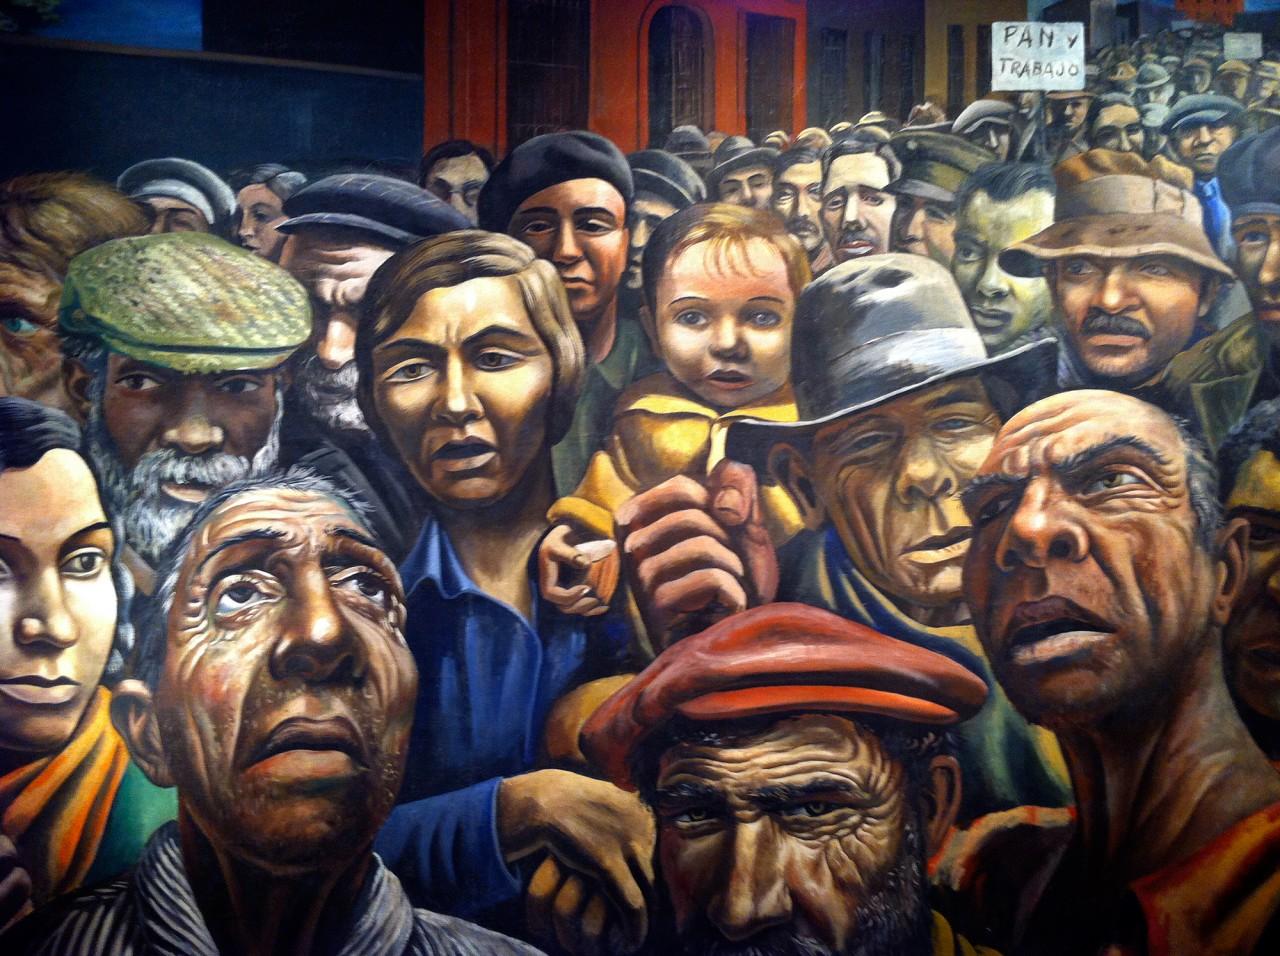 Antonio-Berni-Museum-Art-Buenos-Aires-1280x956 Manifestación, 1934 [Public Demonstration] by Antonio Berni (1905–1981)